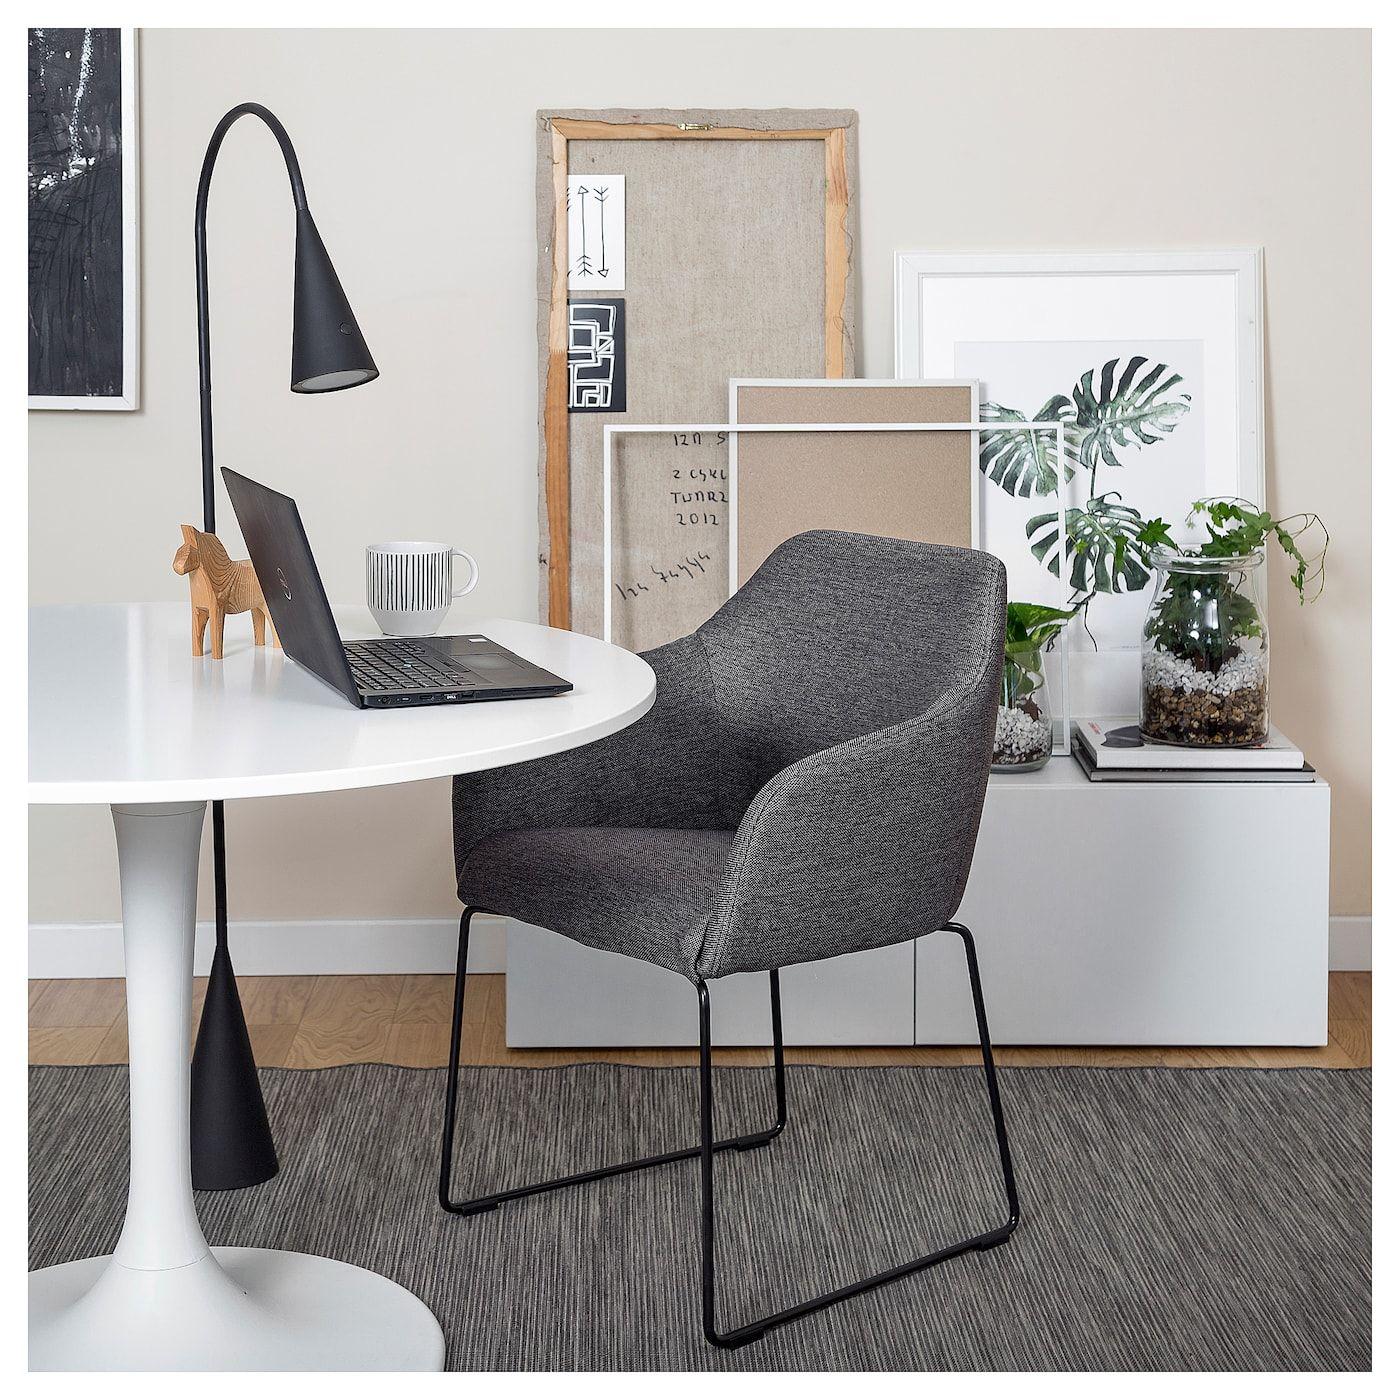 IKEA TOSSBERG Chair metal black, gray Metal chairs